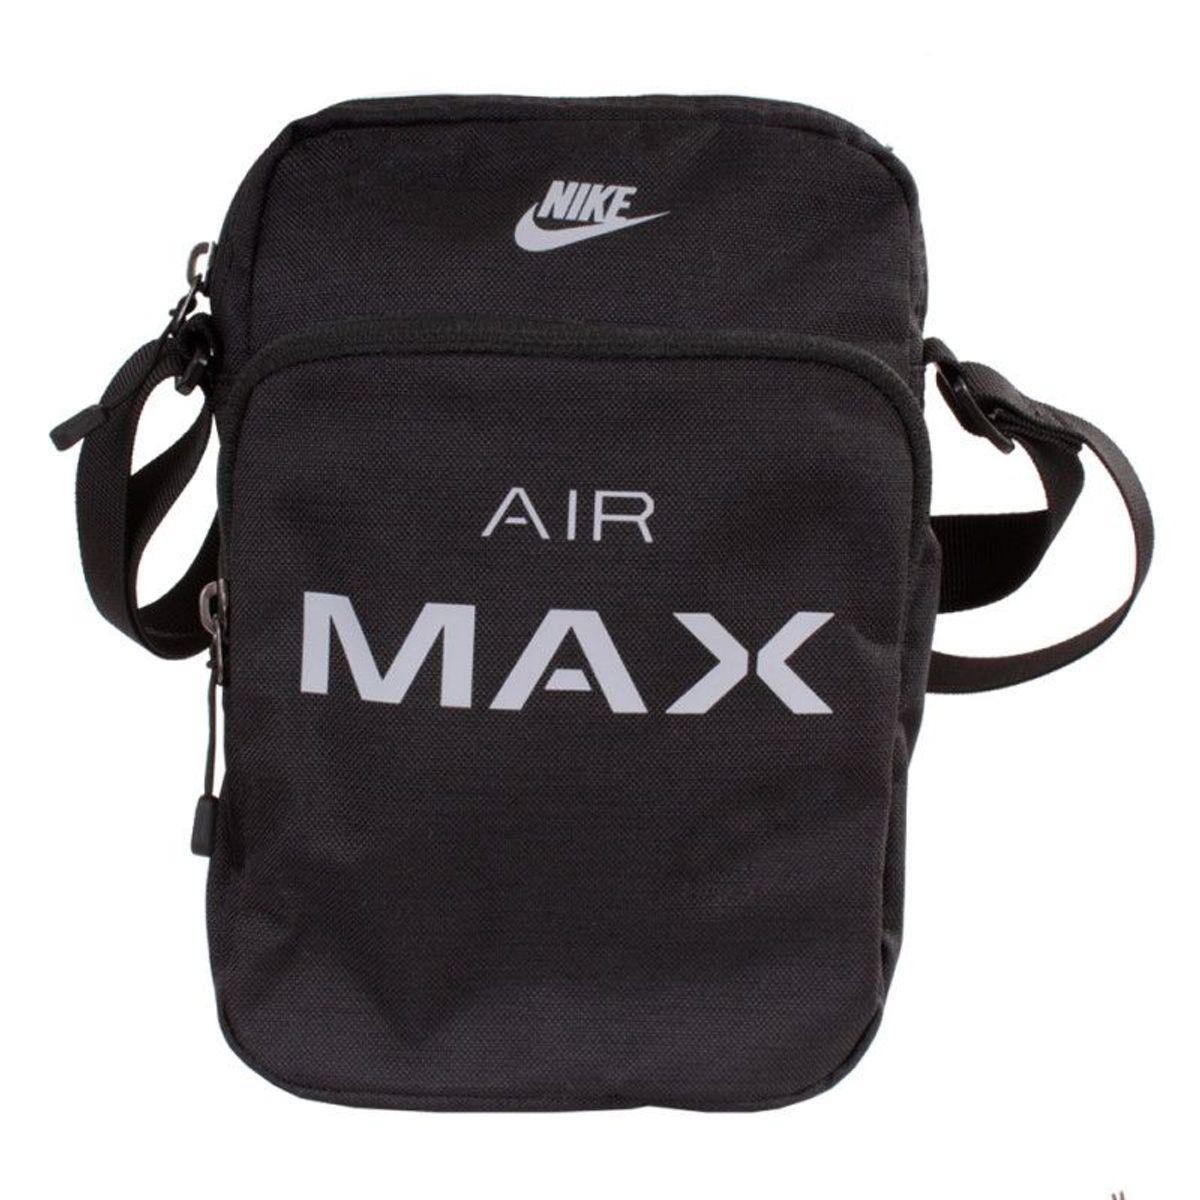 e03f72991 Shoulder Bag Nike Air Max Pochete Preto Original | Bolsa Masculina ...